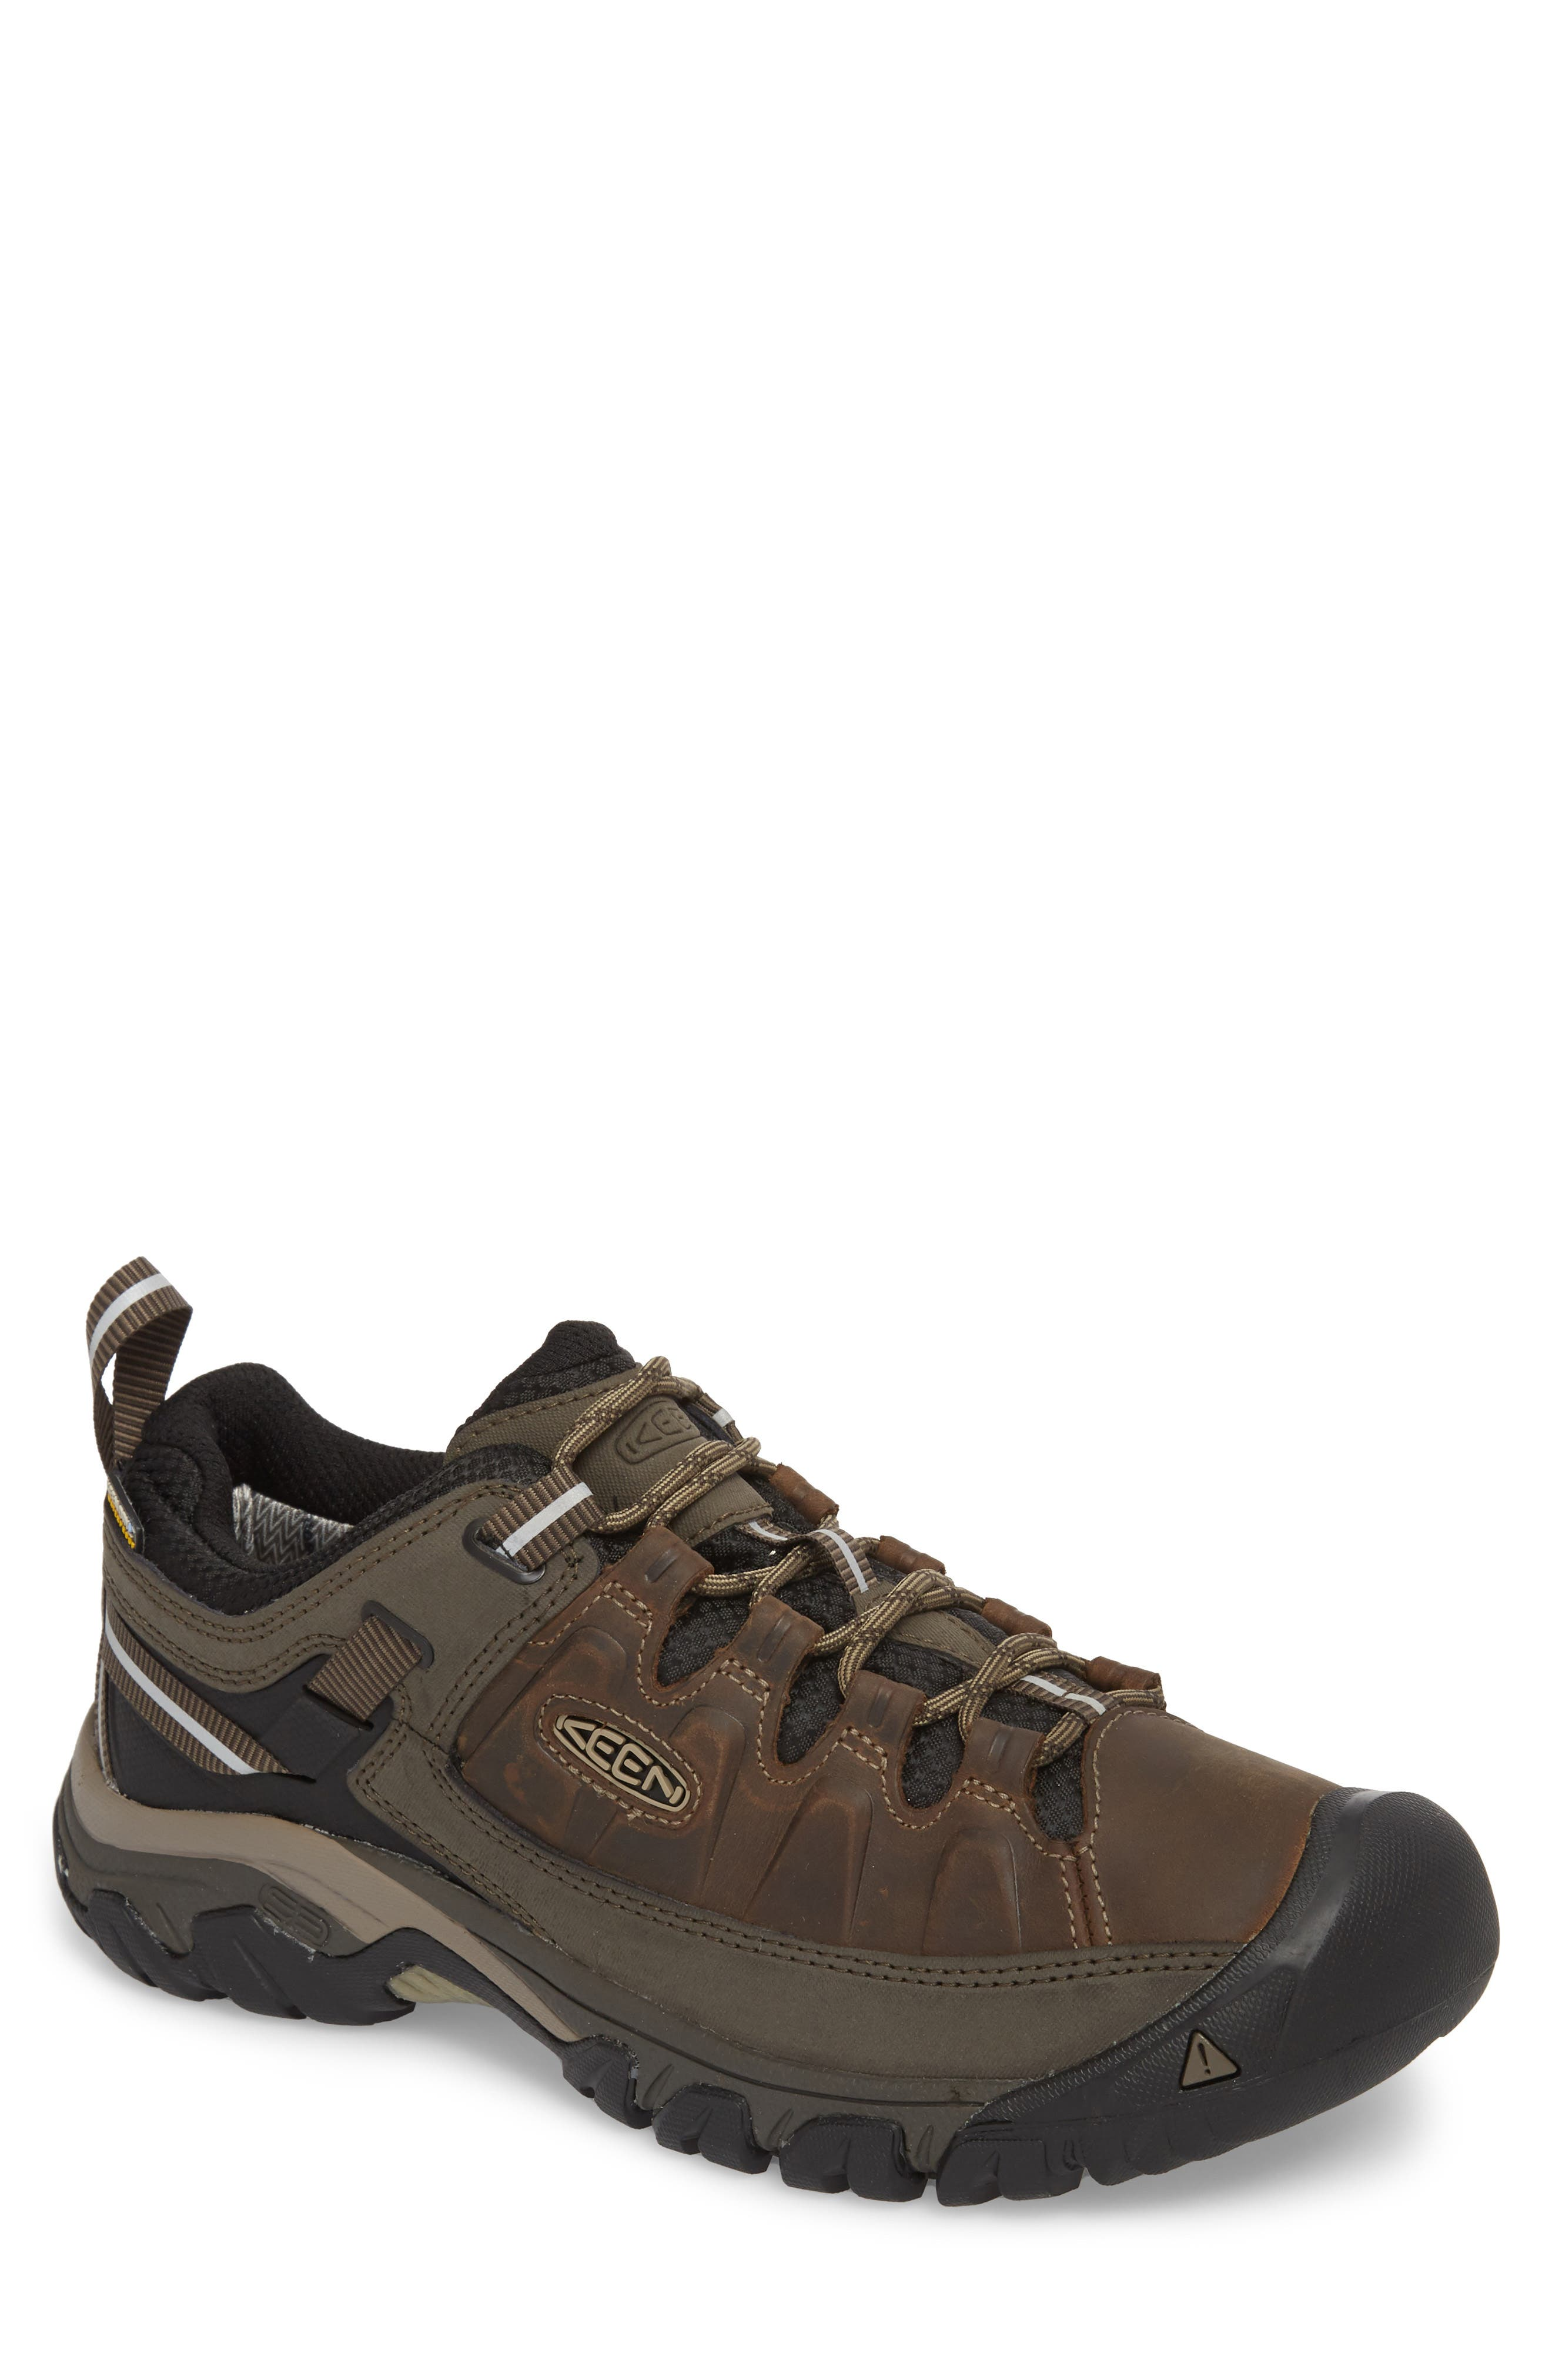 Targhee III Waterproof Hiking Shoe,                             Main thumbnail 1, color,                             Bungee Cord/Black